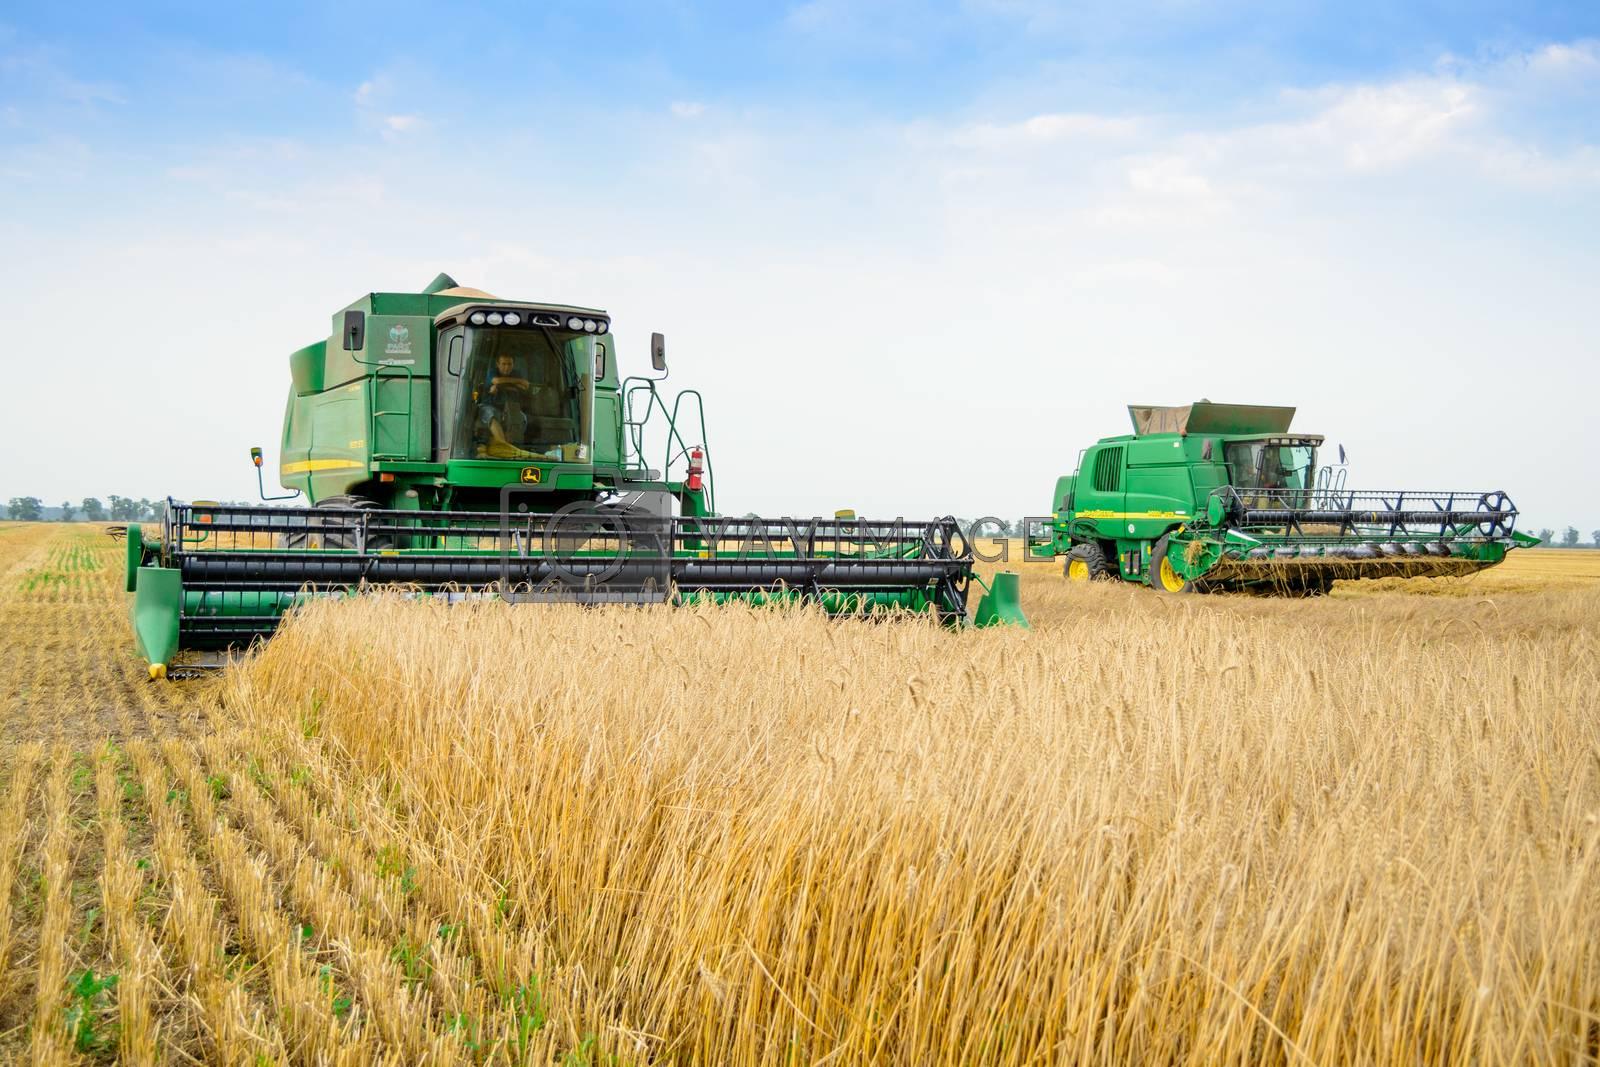 ZAPORIZHZHYA, UKRAINE - July 28, 2015: Two John Deere Combine Harvesters Harvesting Wheat in the Field.